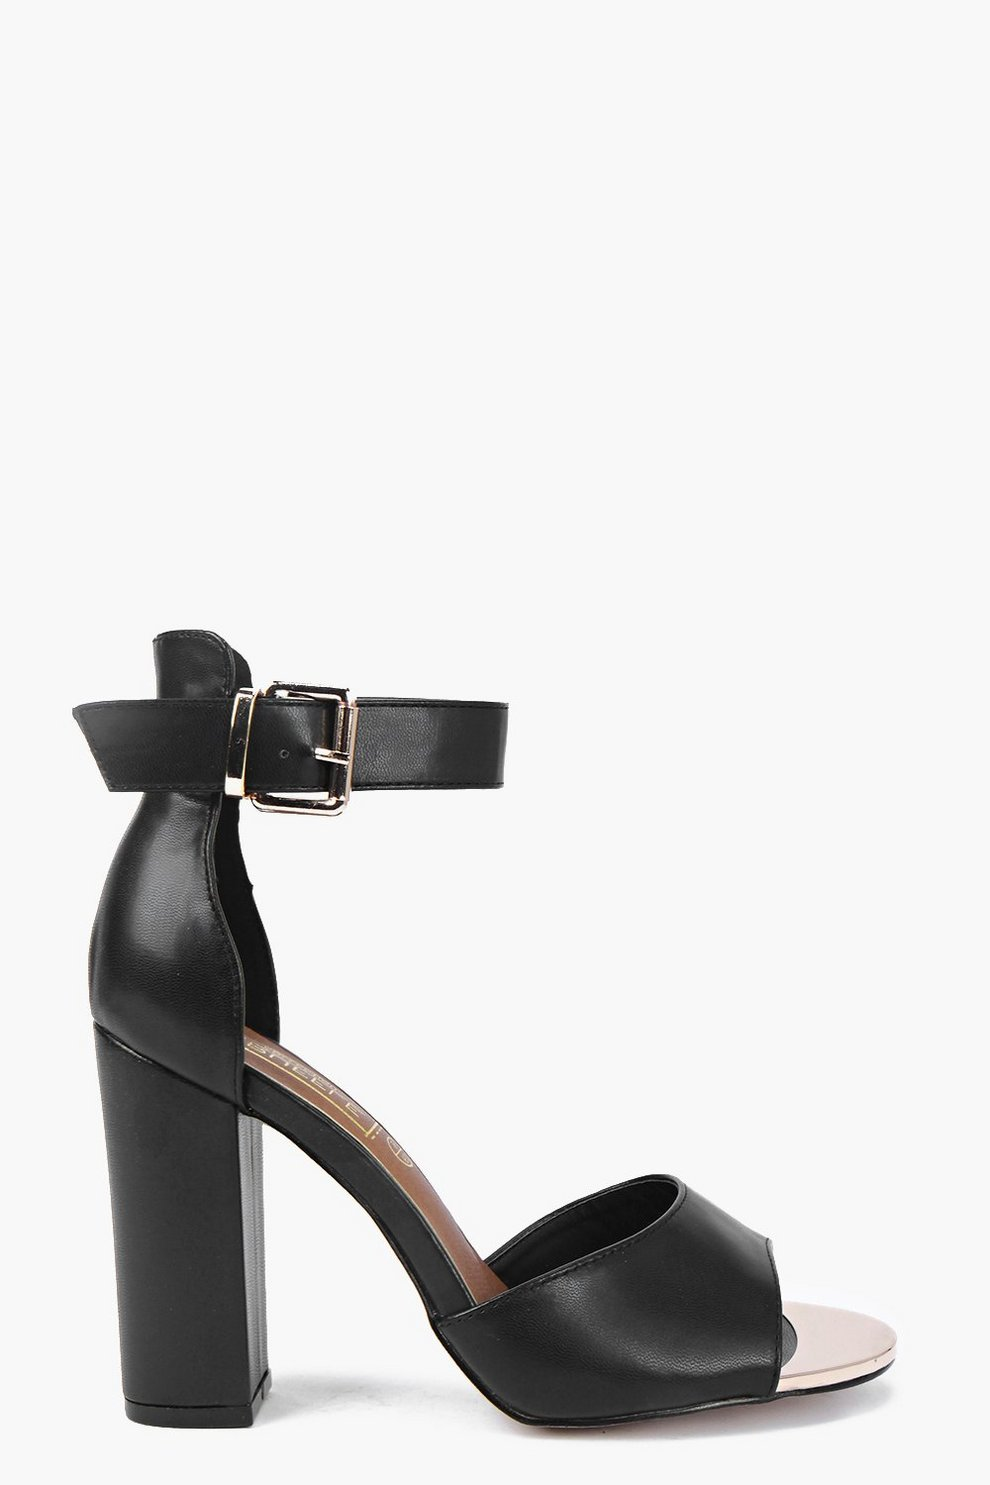 f883fc4d755 Mia Block Heel Metal Toe Peeptoe